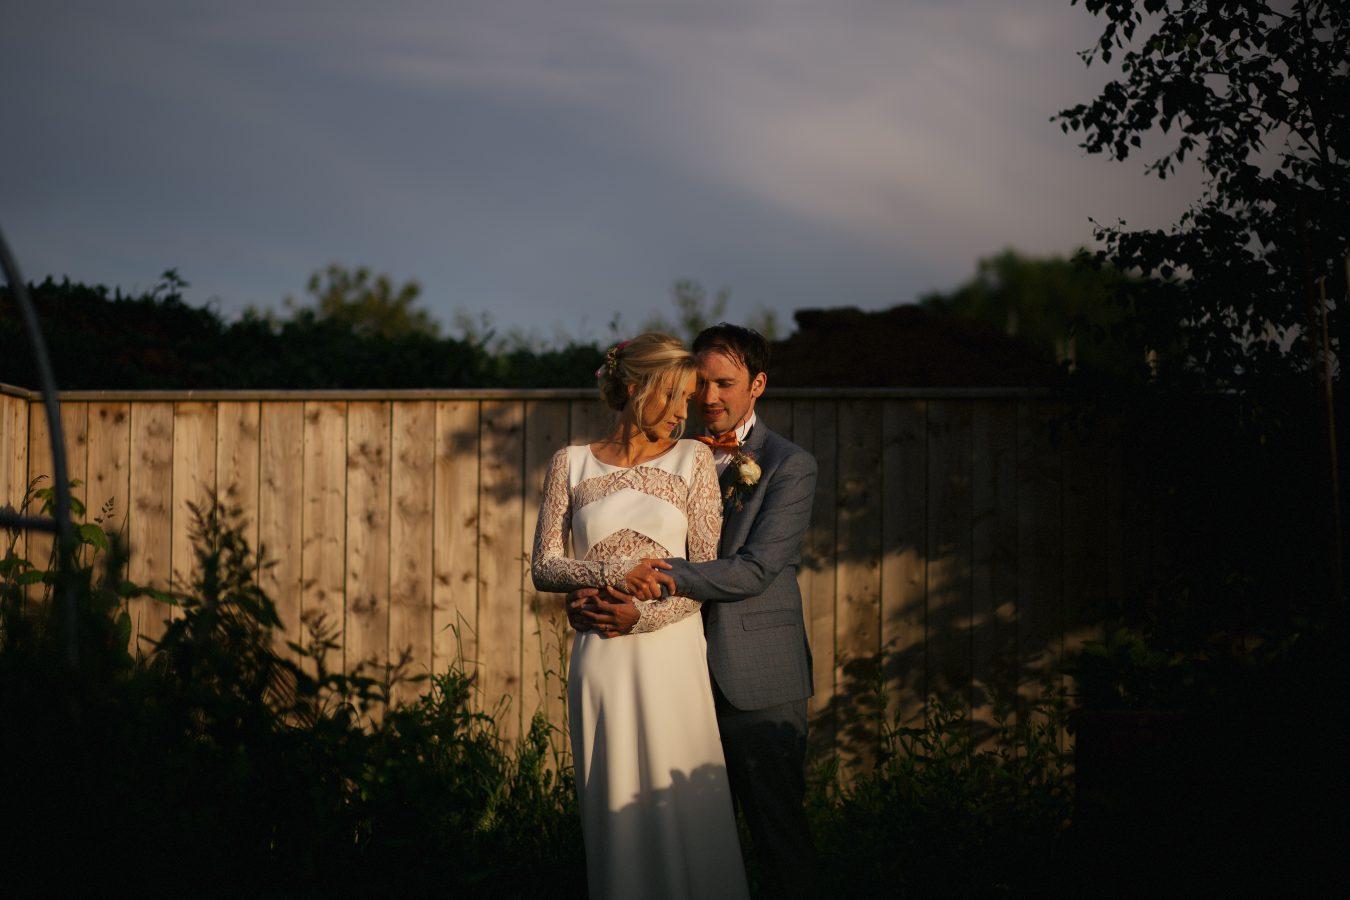 Sarah-Seamy-Jules-Barron-Alternative-Wedding-Venue-2018-790